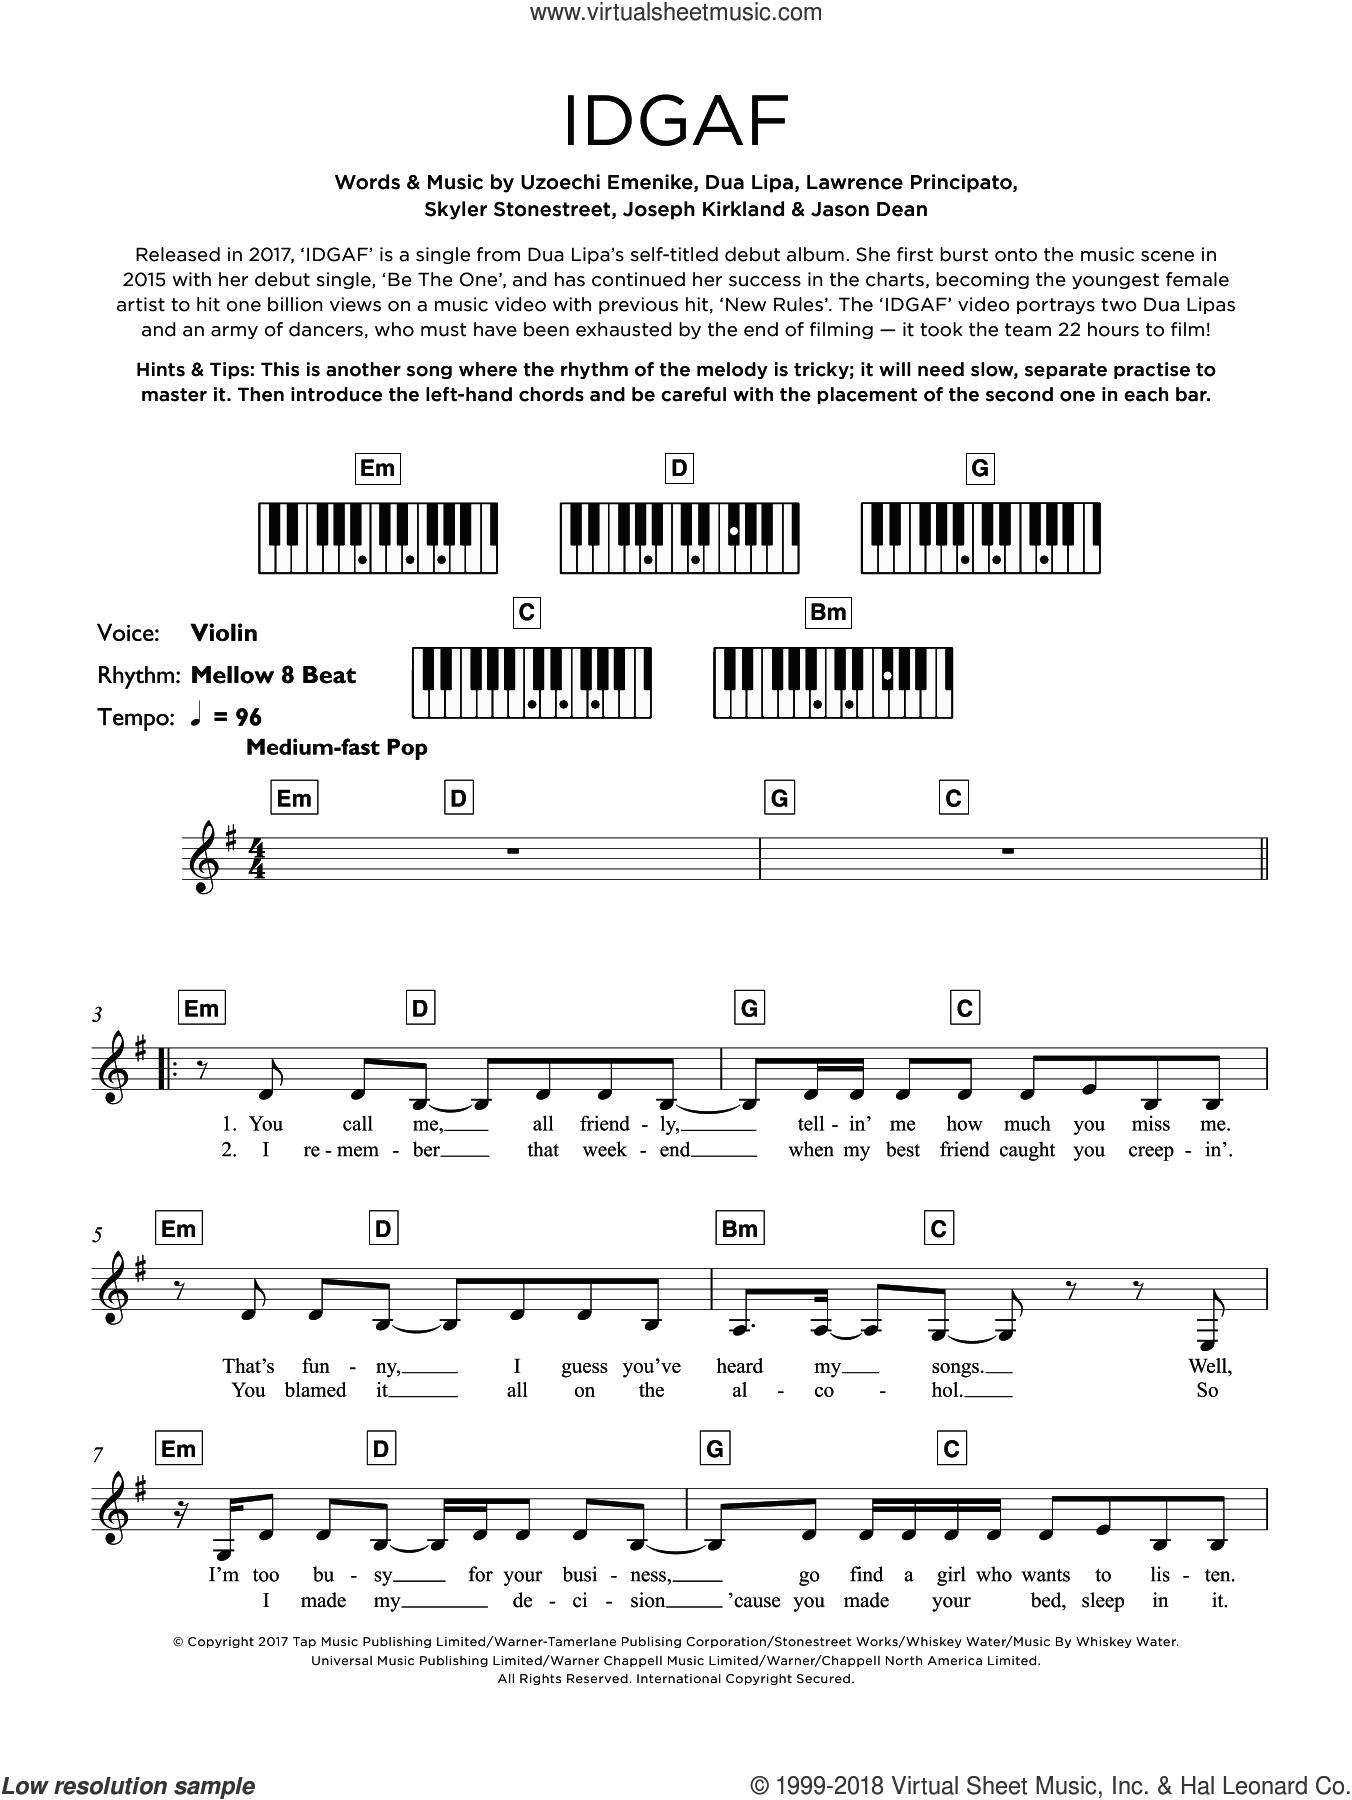 IDGAF sheet music for piano solo (keyboard) by Dua Lipa, Jason Dean, Joseph Kirkland, Lawrence Principato, Skyler Stonestreet and Uzoechi Emenike, intermediate piano (keyboard)